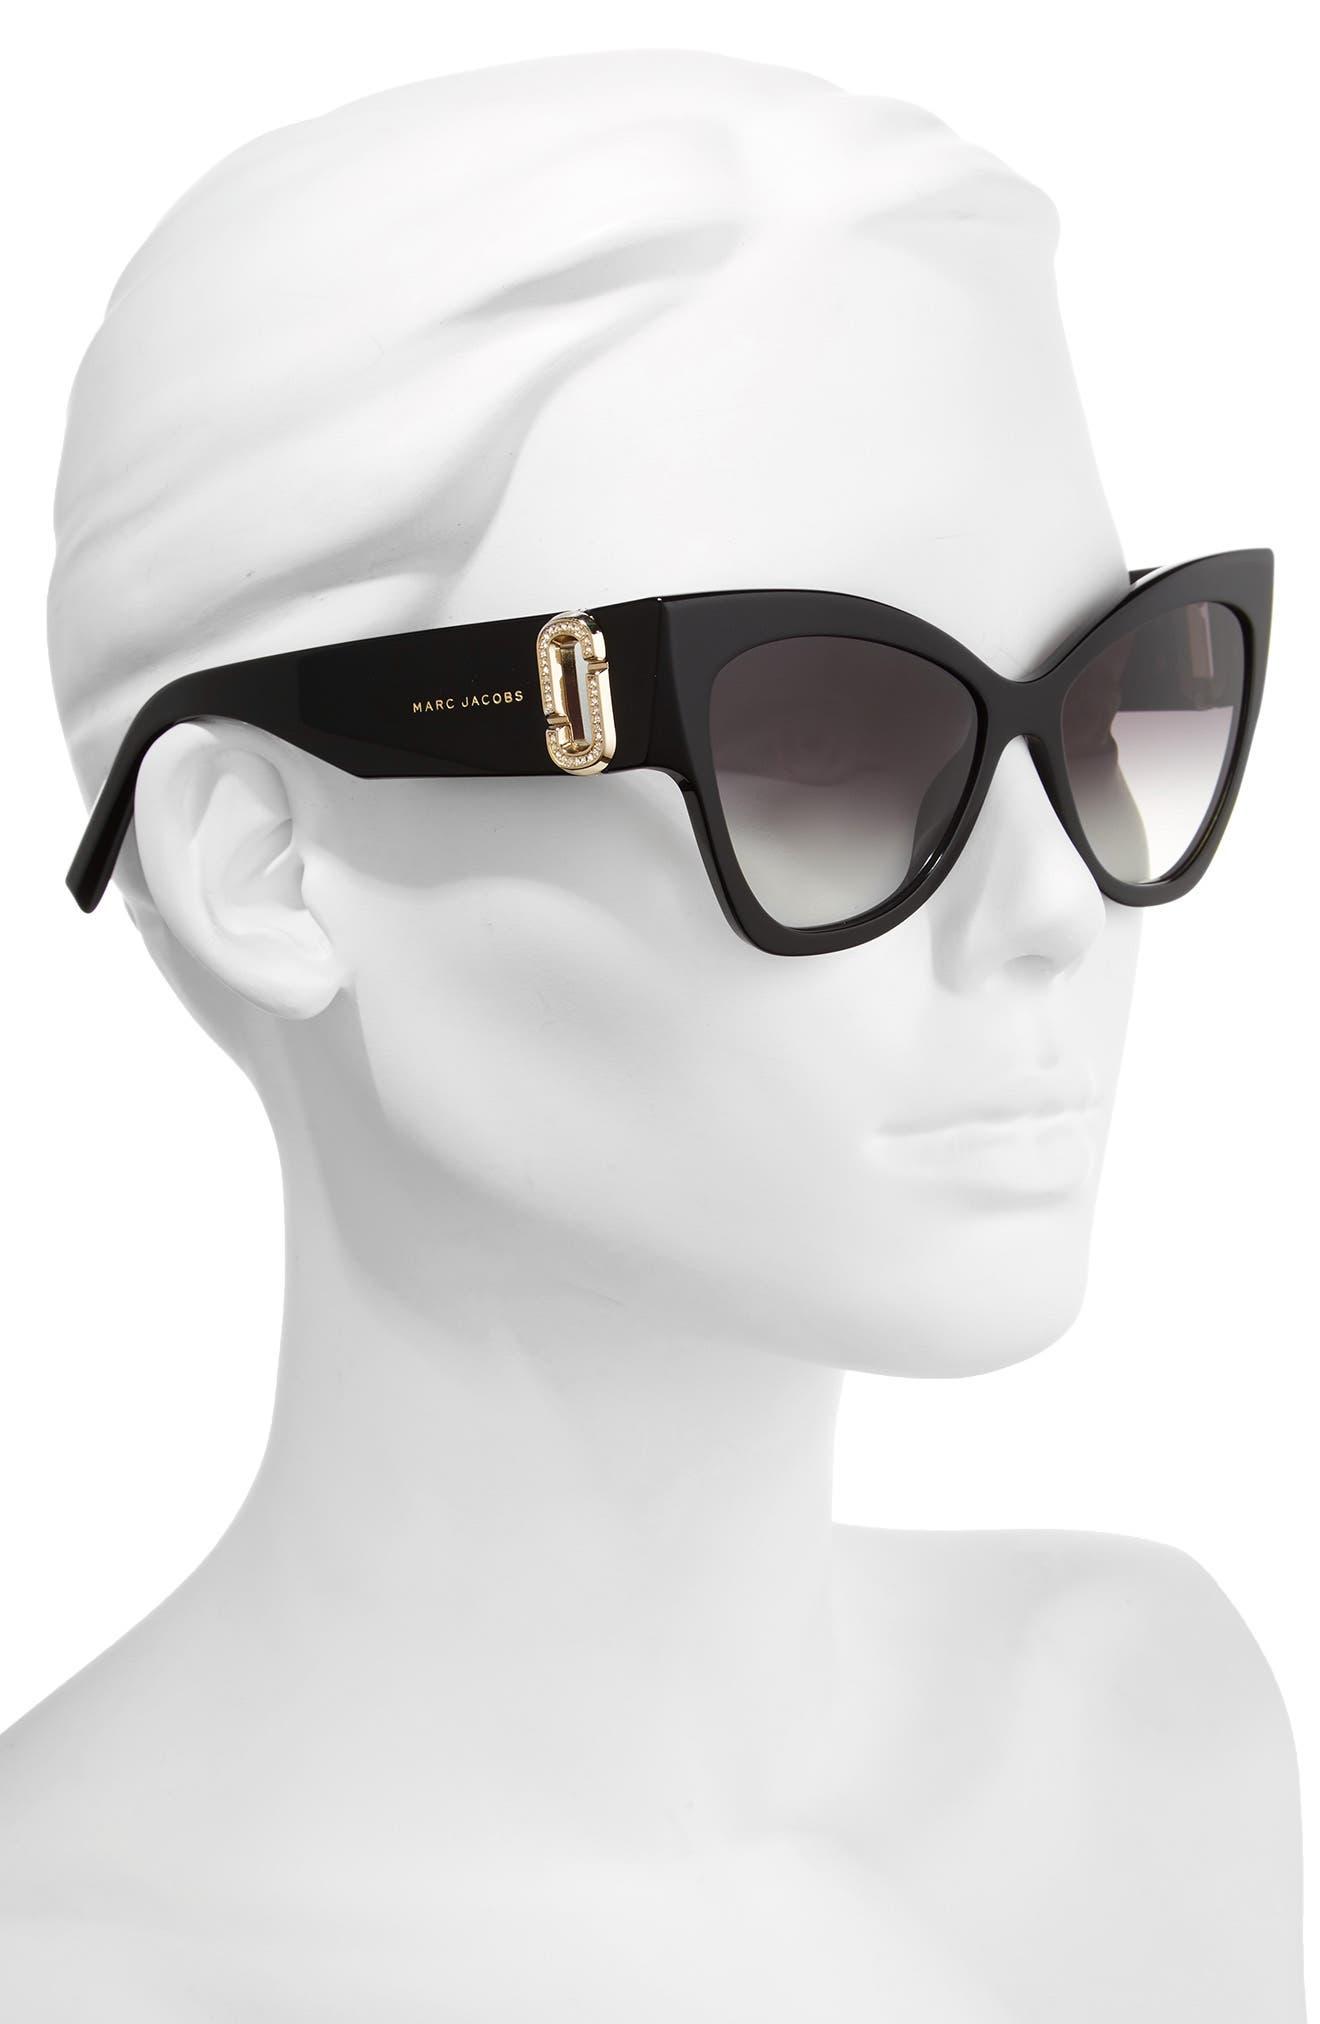 54mm Cat Eye Sunglasses,                             Alternate thumbnail 2, color,                             Black